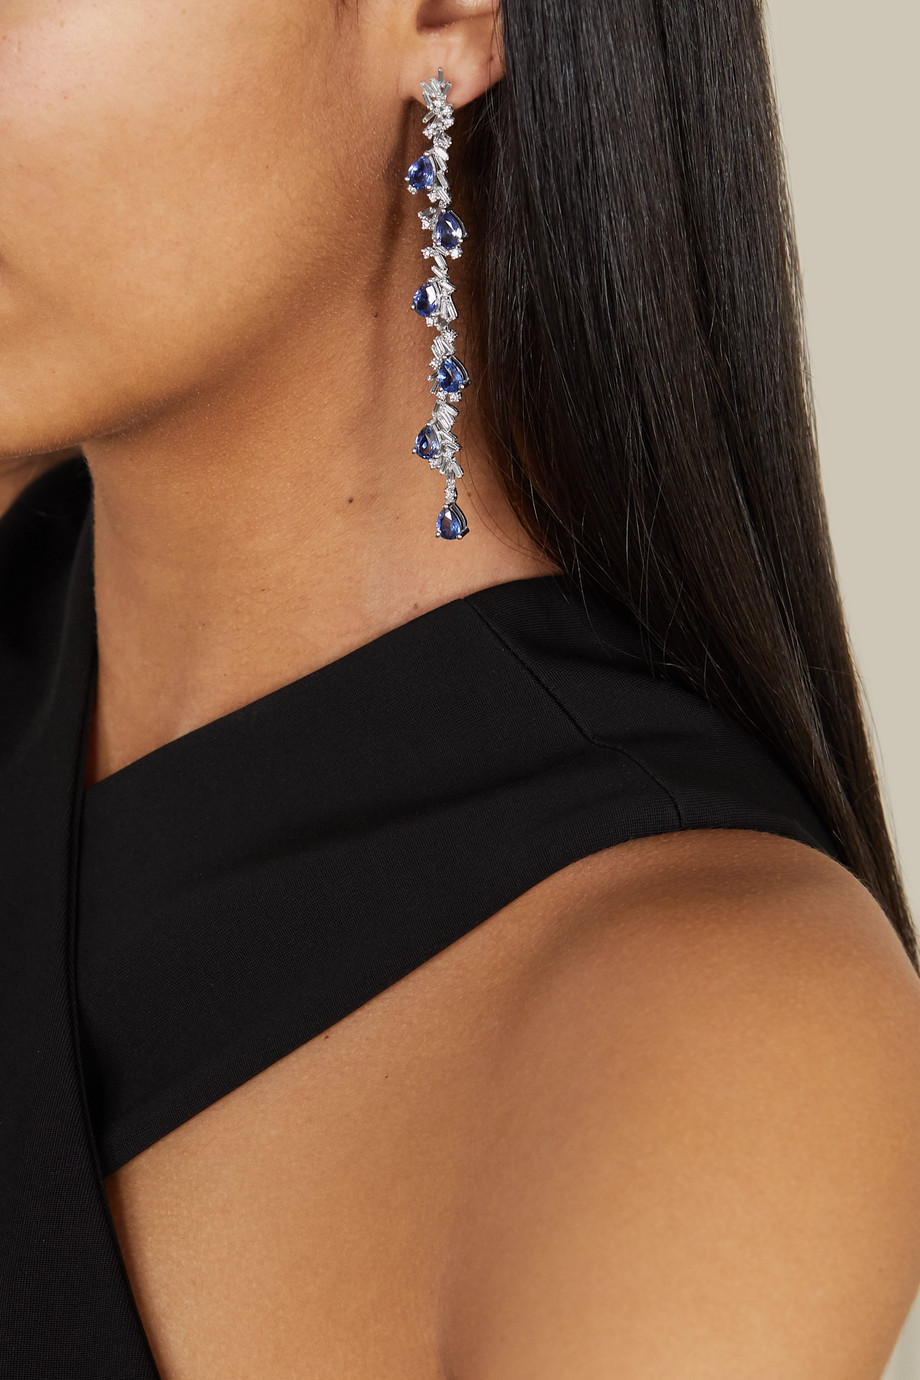 Suzanne Kalan 18-karat white gold, sapphire and diamond earrings